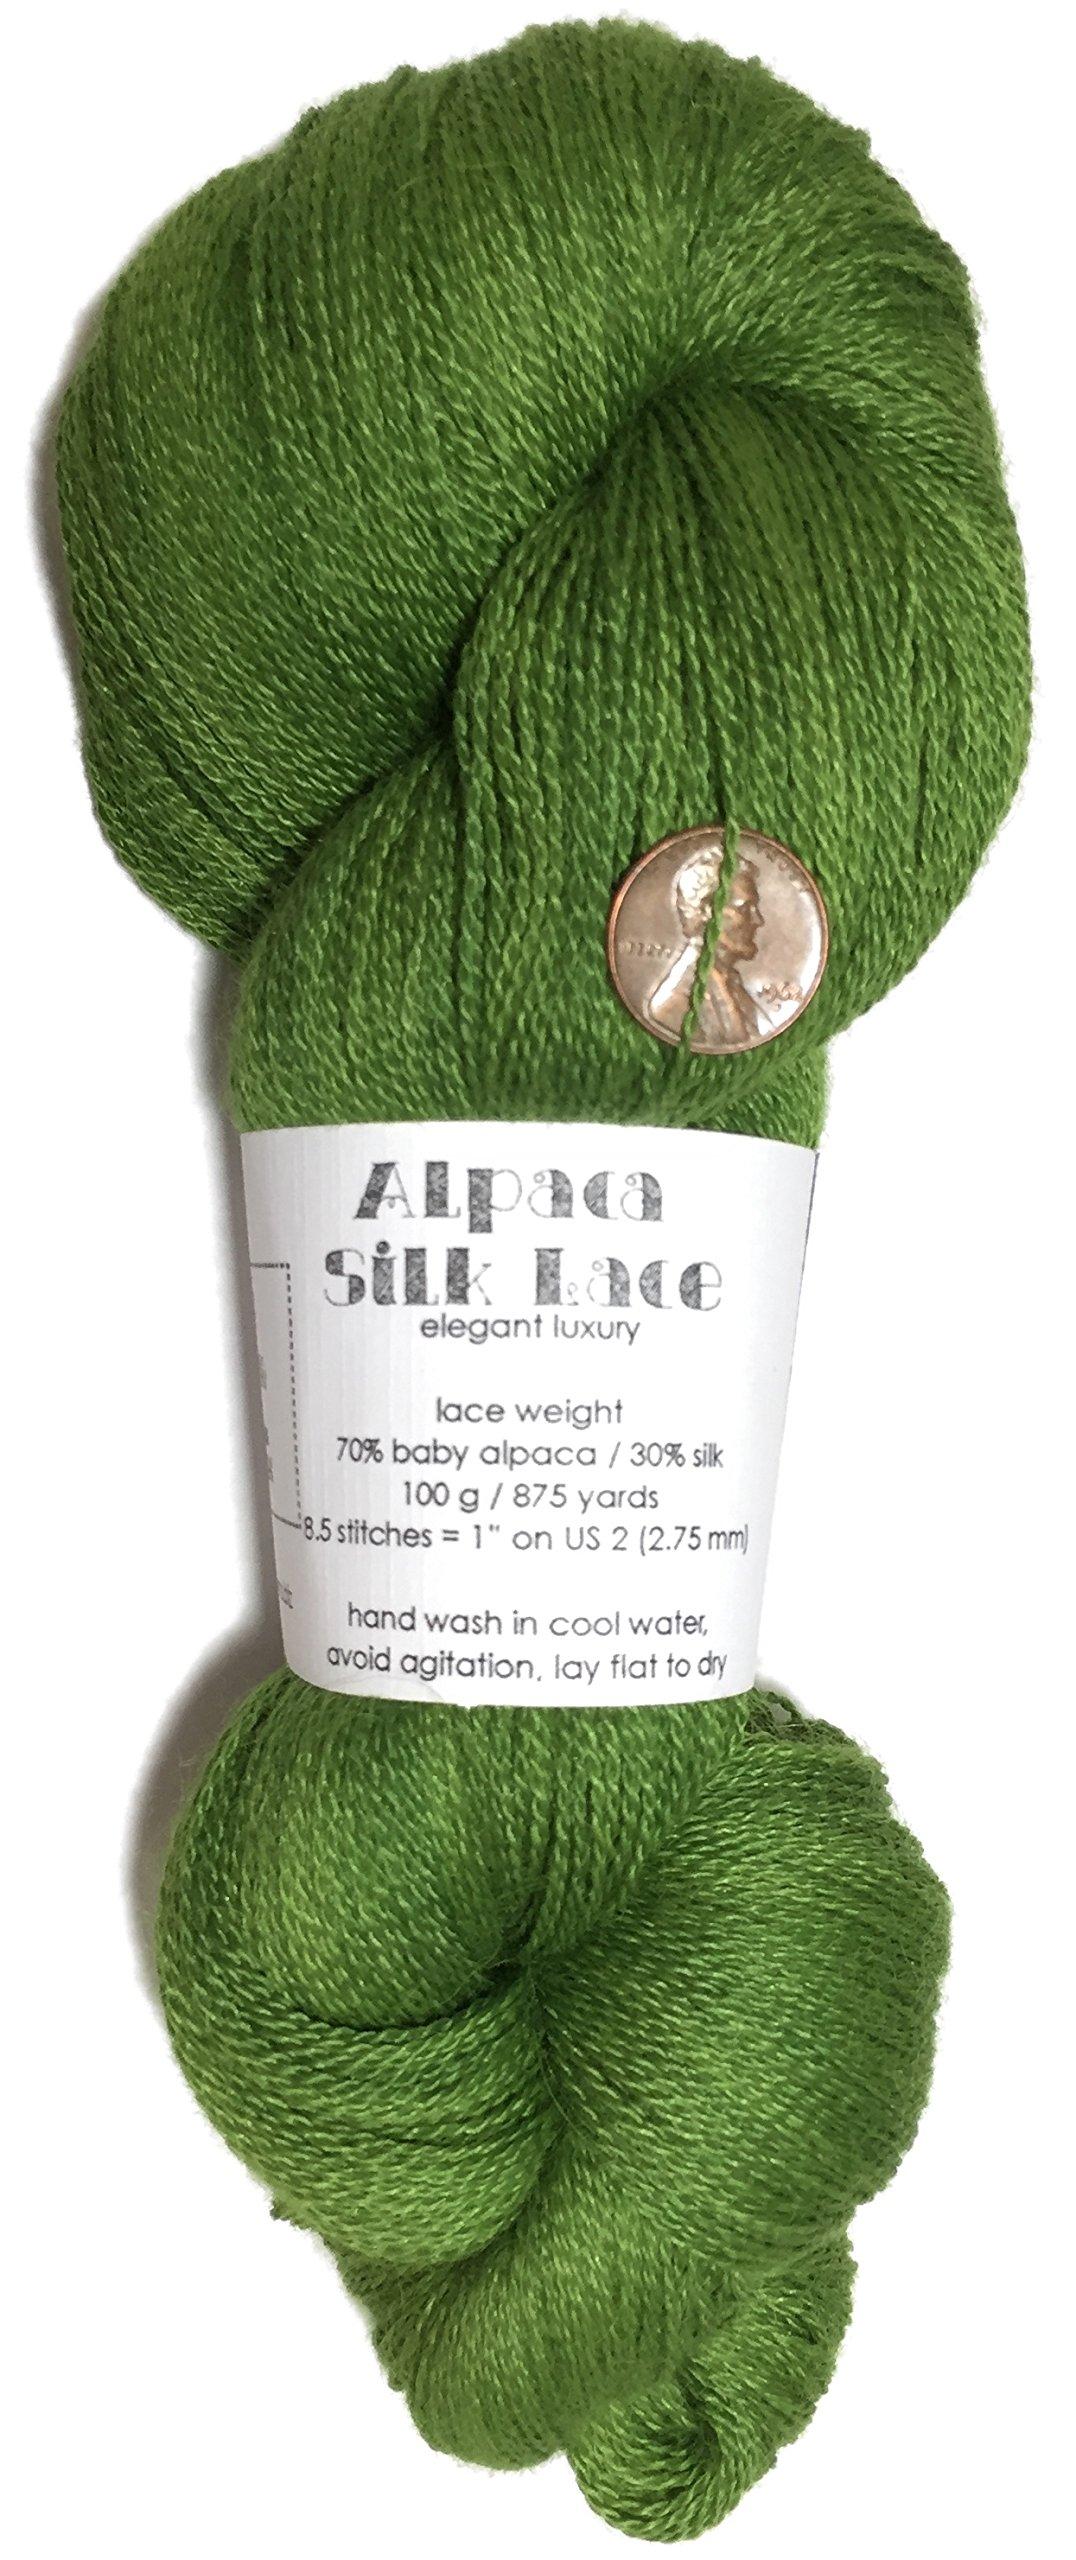 Hand Dyed Alpaca Silk Yarn, Solid Avocado, Lace Weight, 100 Grams, 875 Yards, 70/30 Baby Alpaca/Mulberry Silk